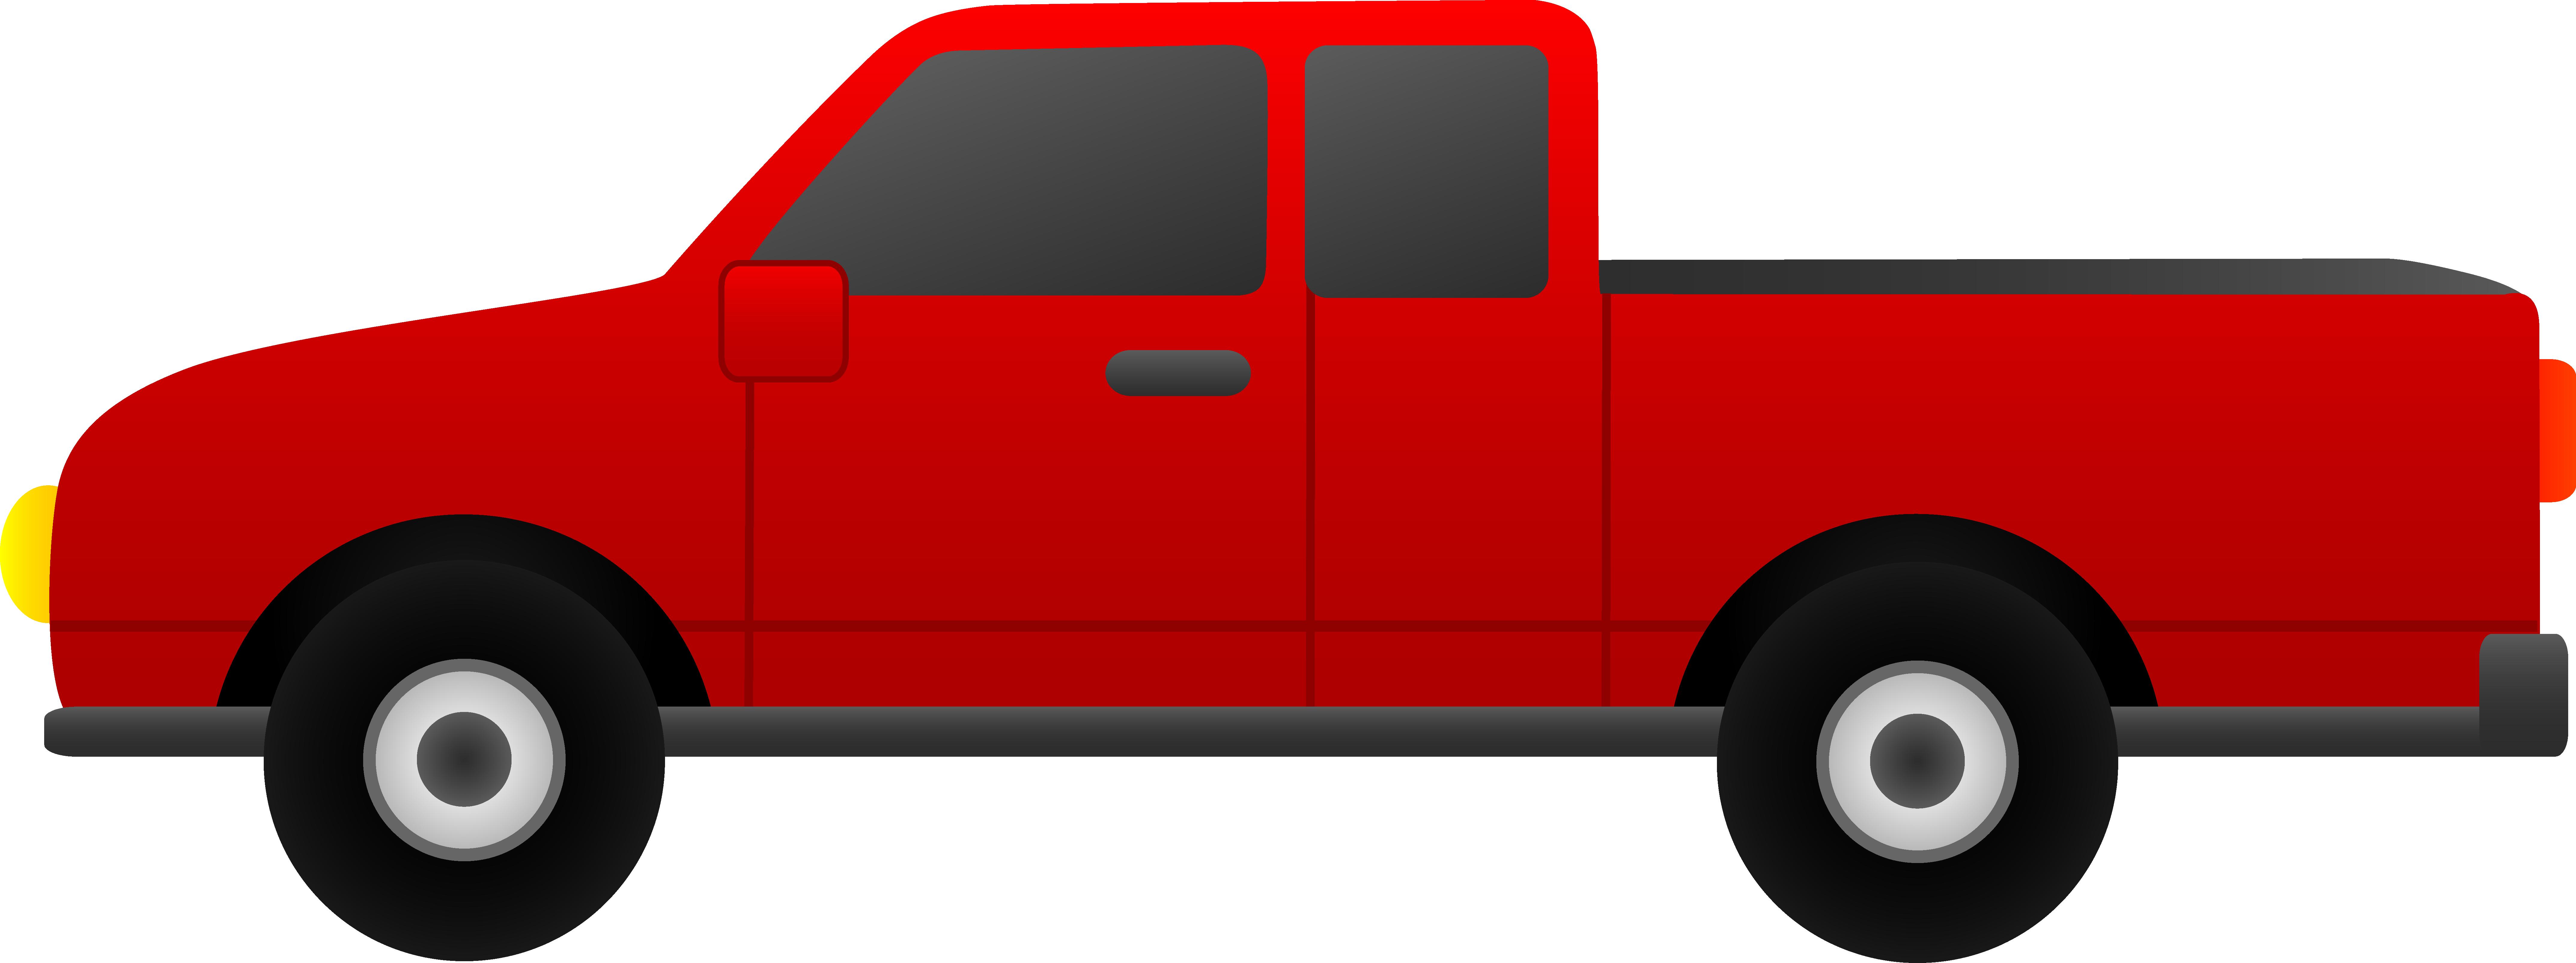 8576x3207 Clipart Of Pickup Trucks